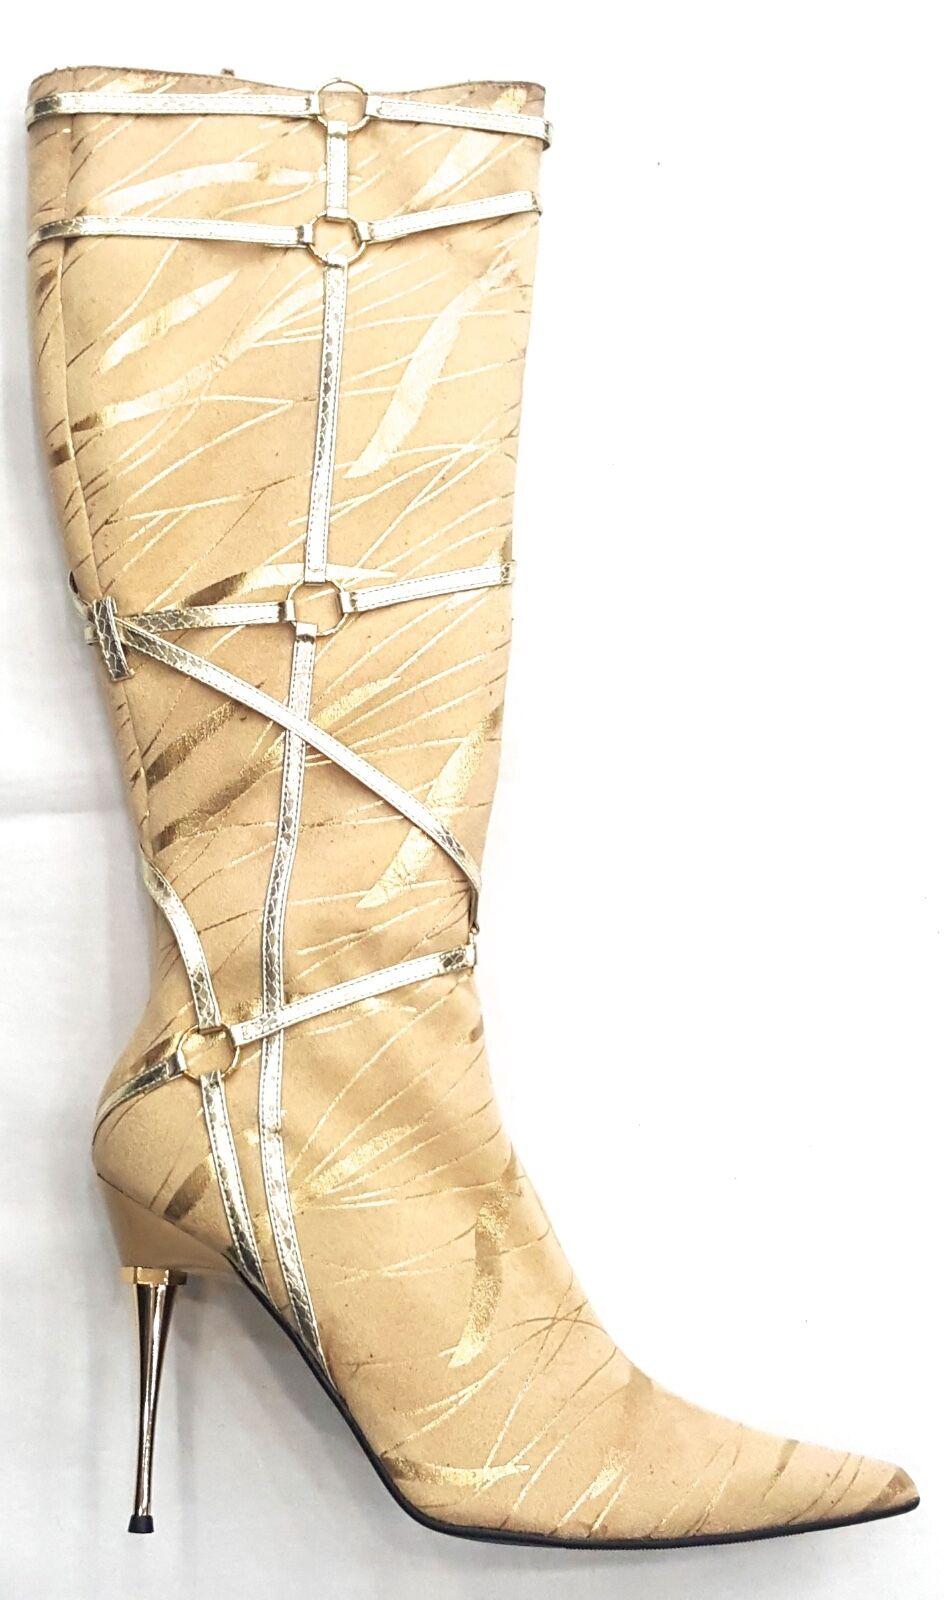 LADY 10 GODIVA CAMEL GOLD SUEDE LIKE Stiefel SIZE 10 LADY d36e75